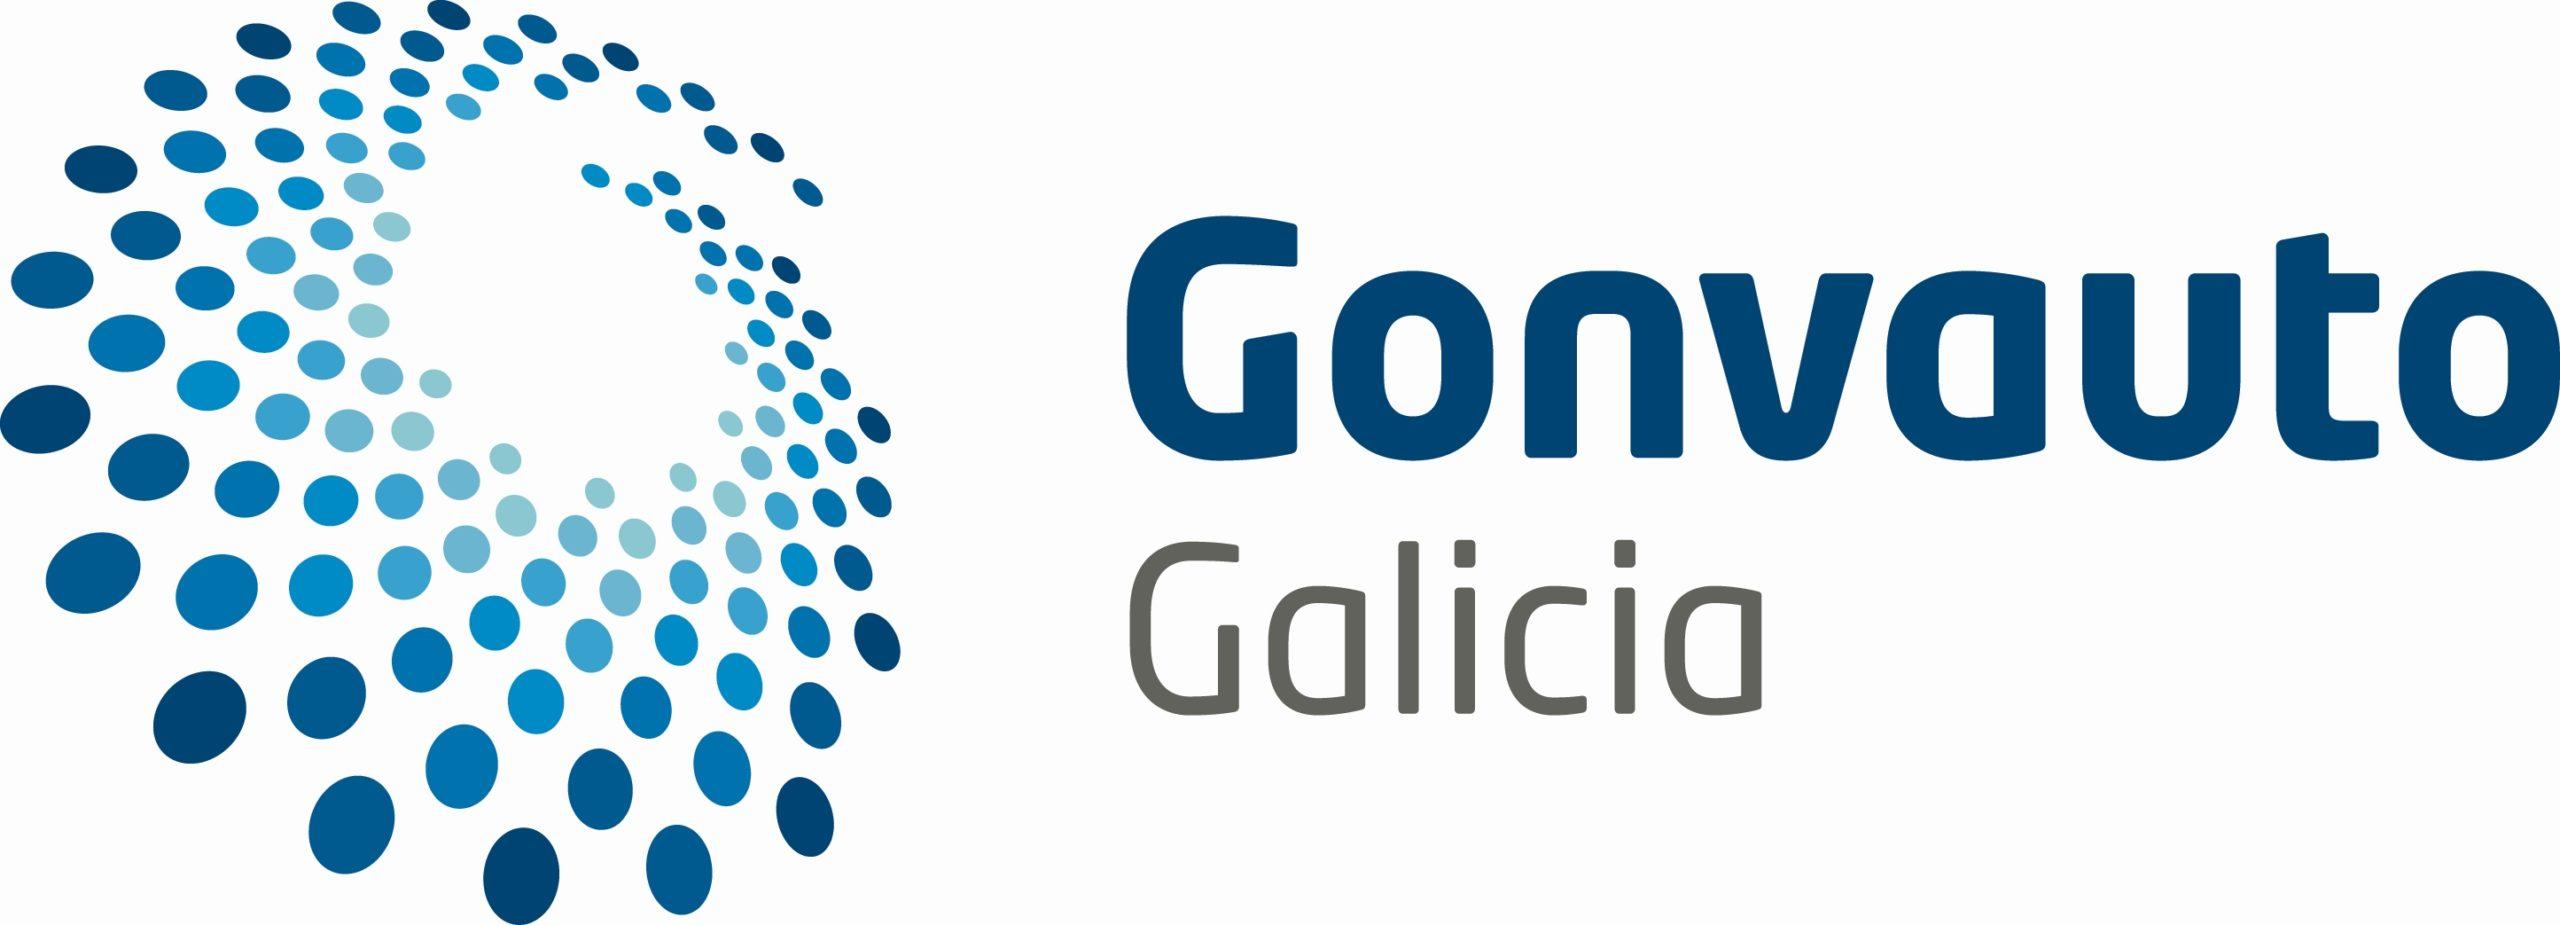 Gonvauto Galicia